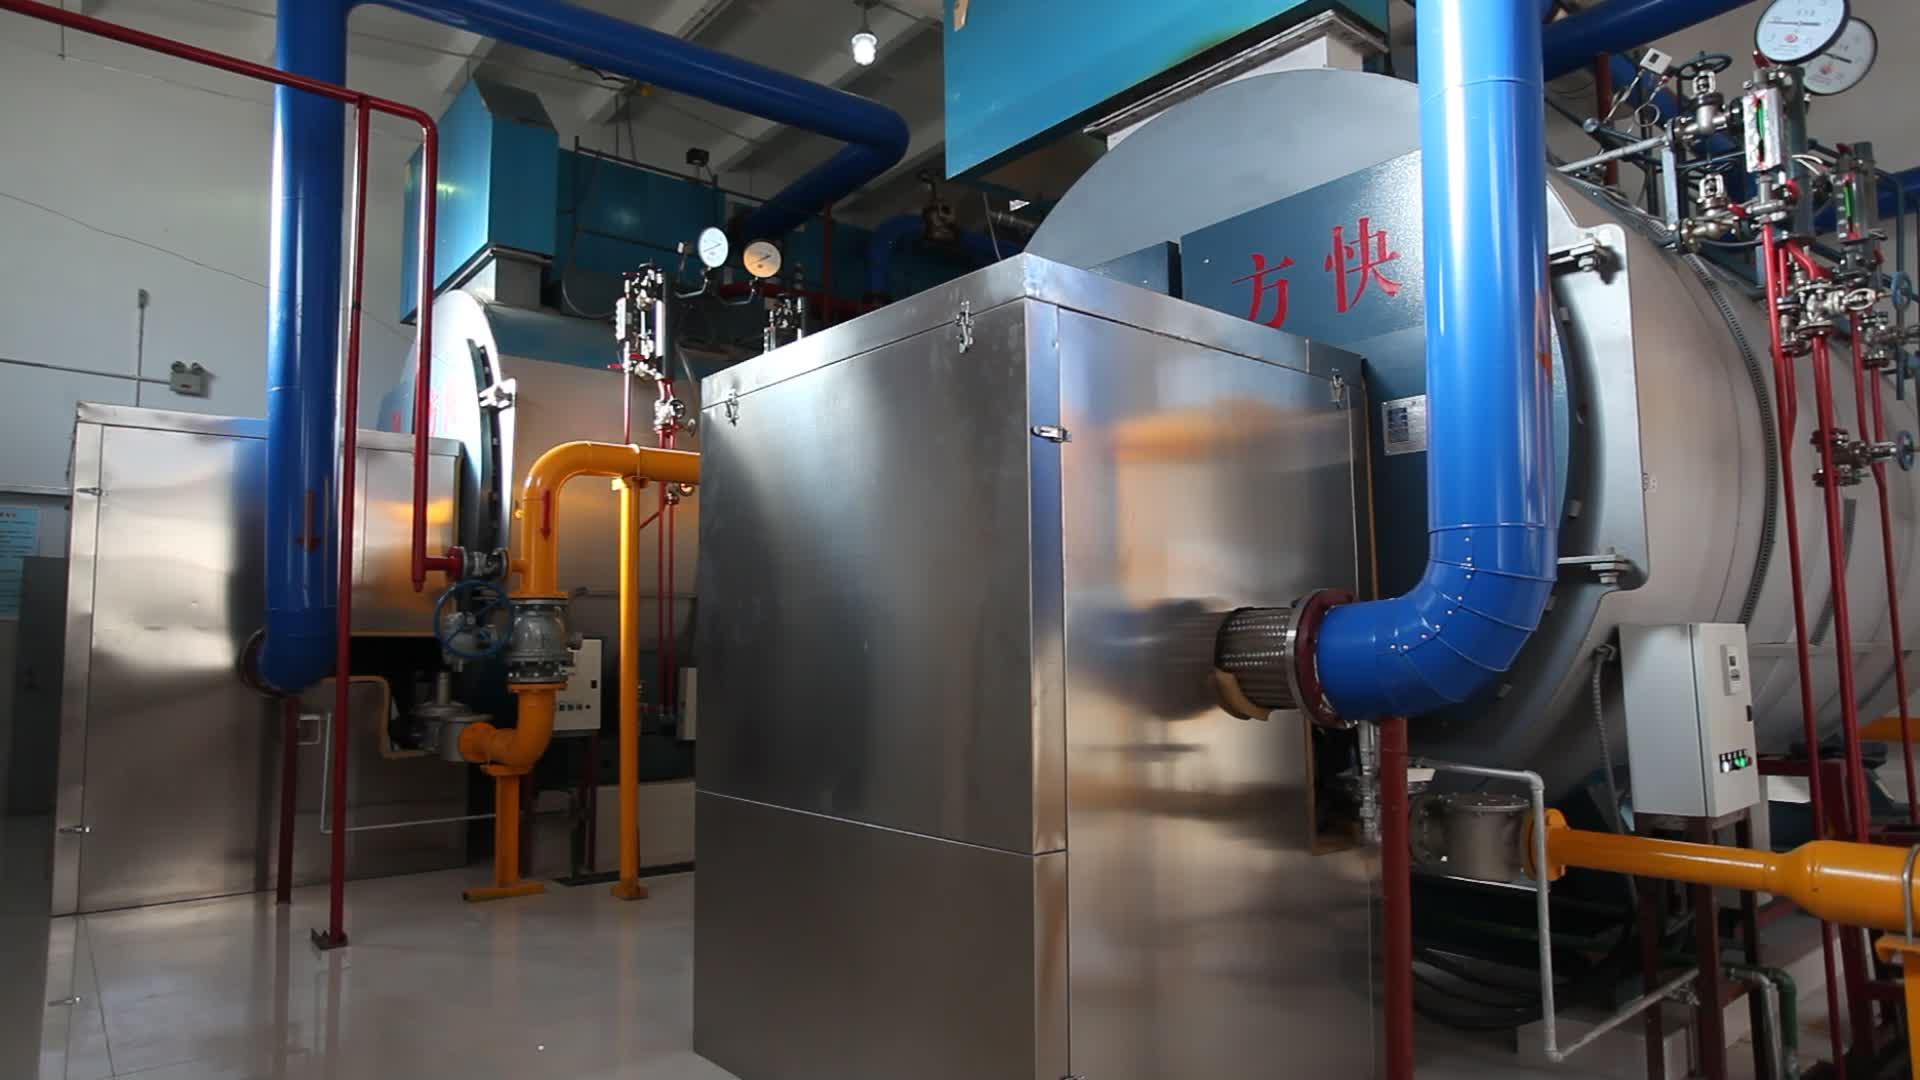 Boiler miura china stoomketel airfel digifel gas boiler prijs